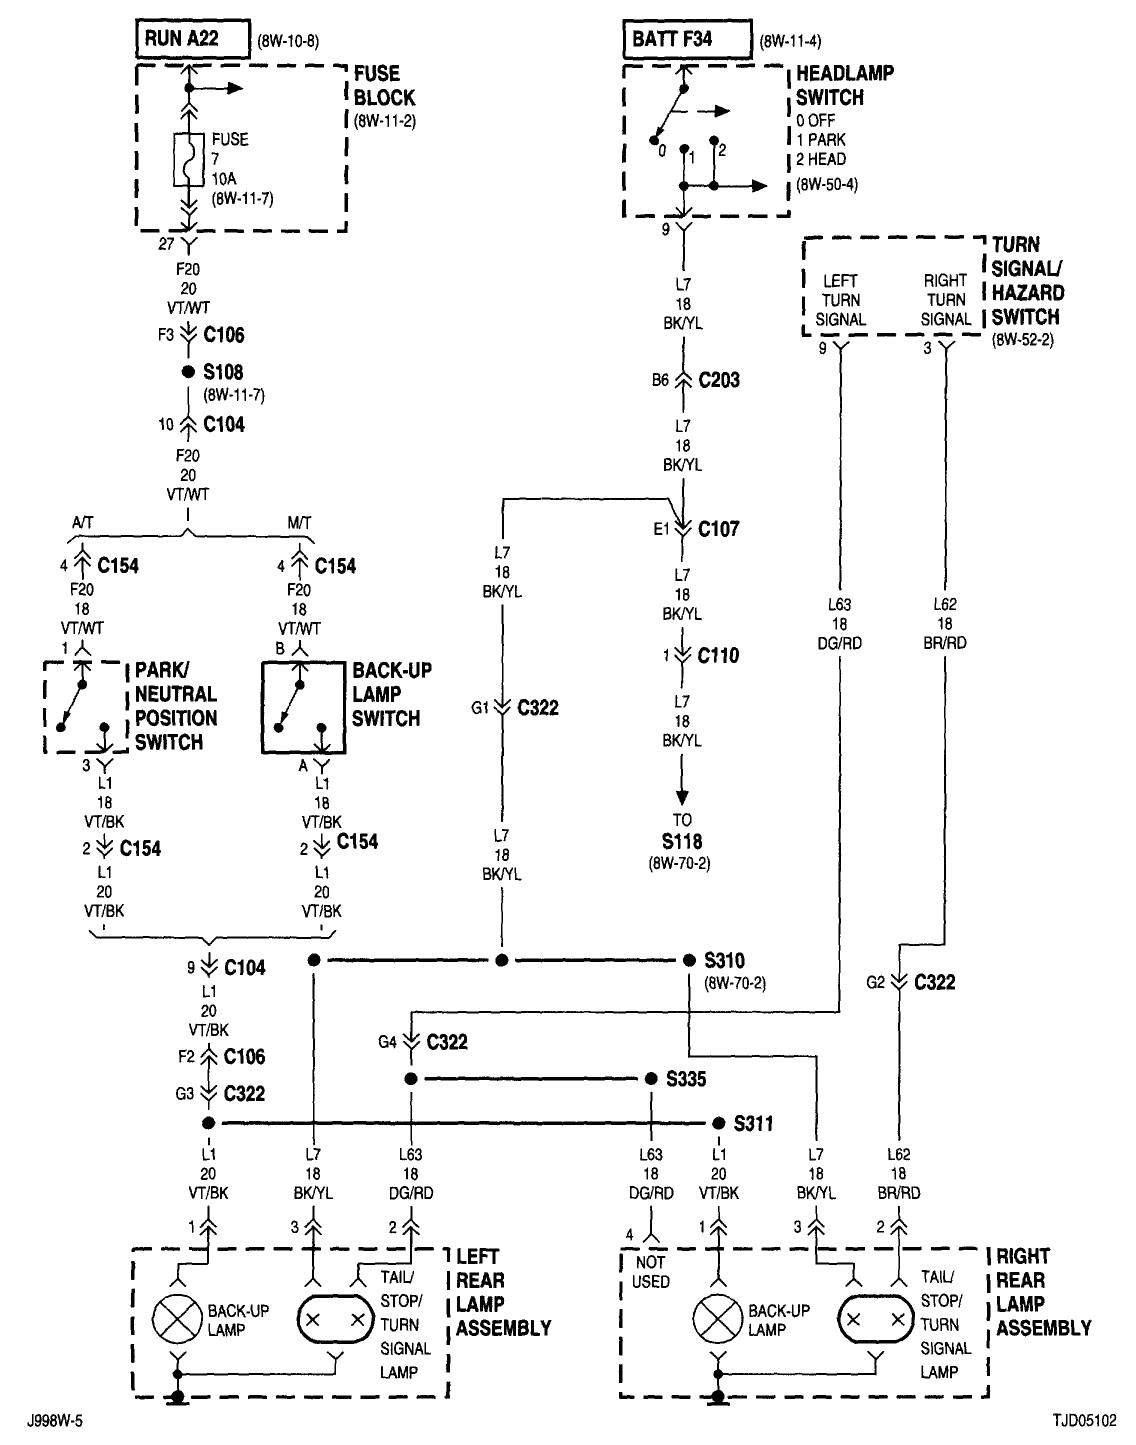 2019 Jeep Wrangler Jl Tail Light Wiring Diagram F63 Rv Tail Light Wiring Diagram Wiring Library